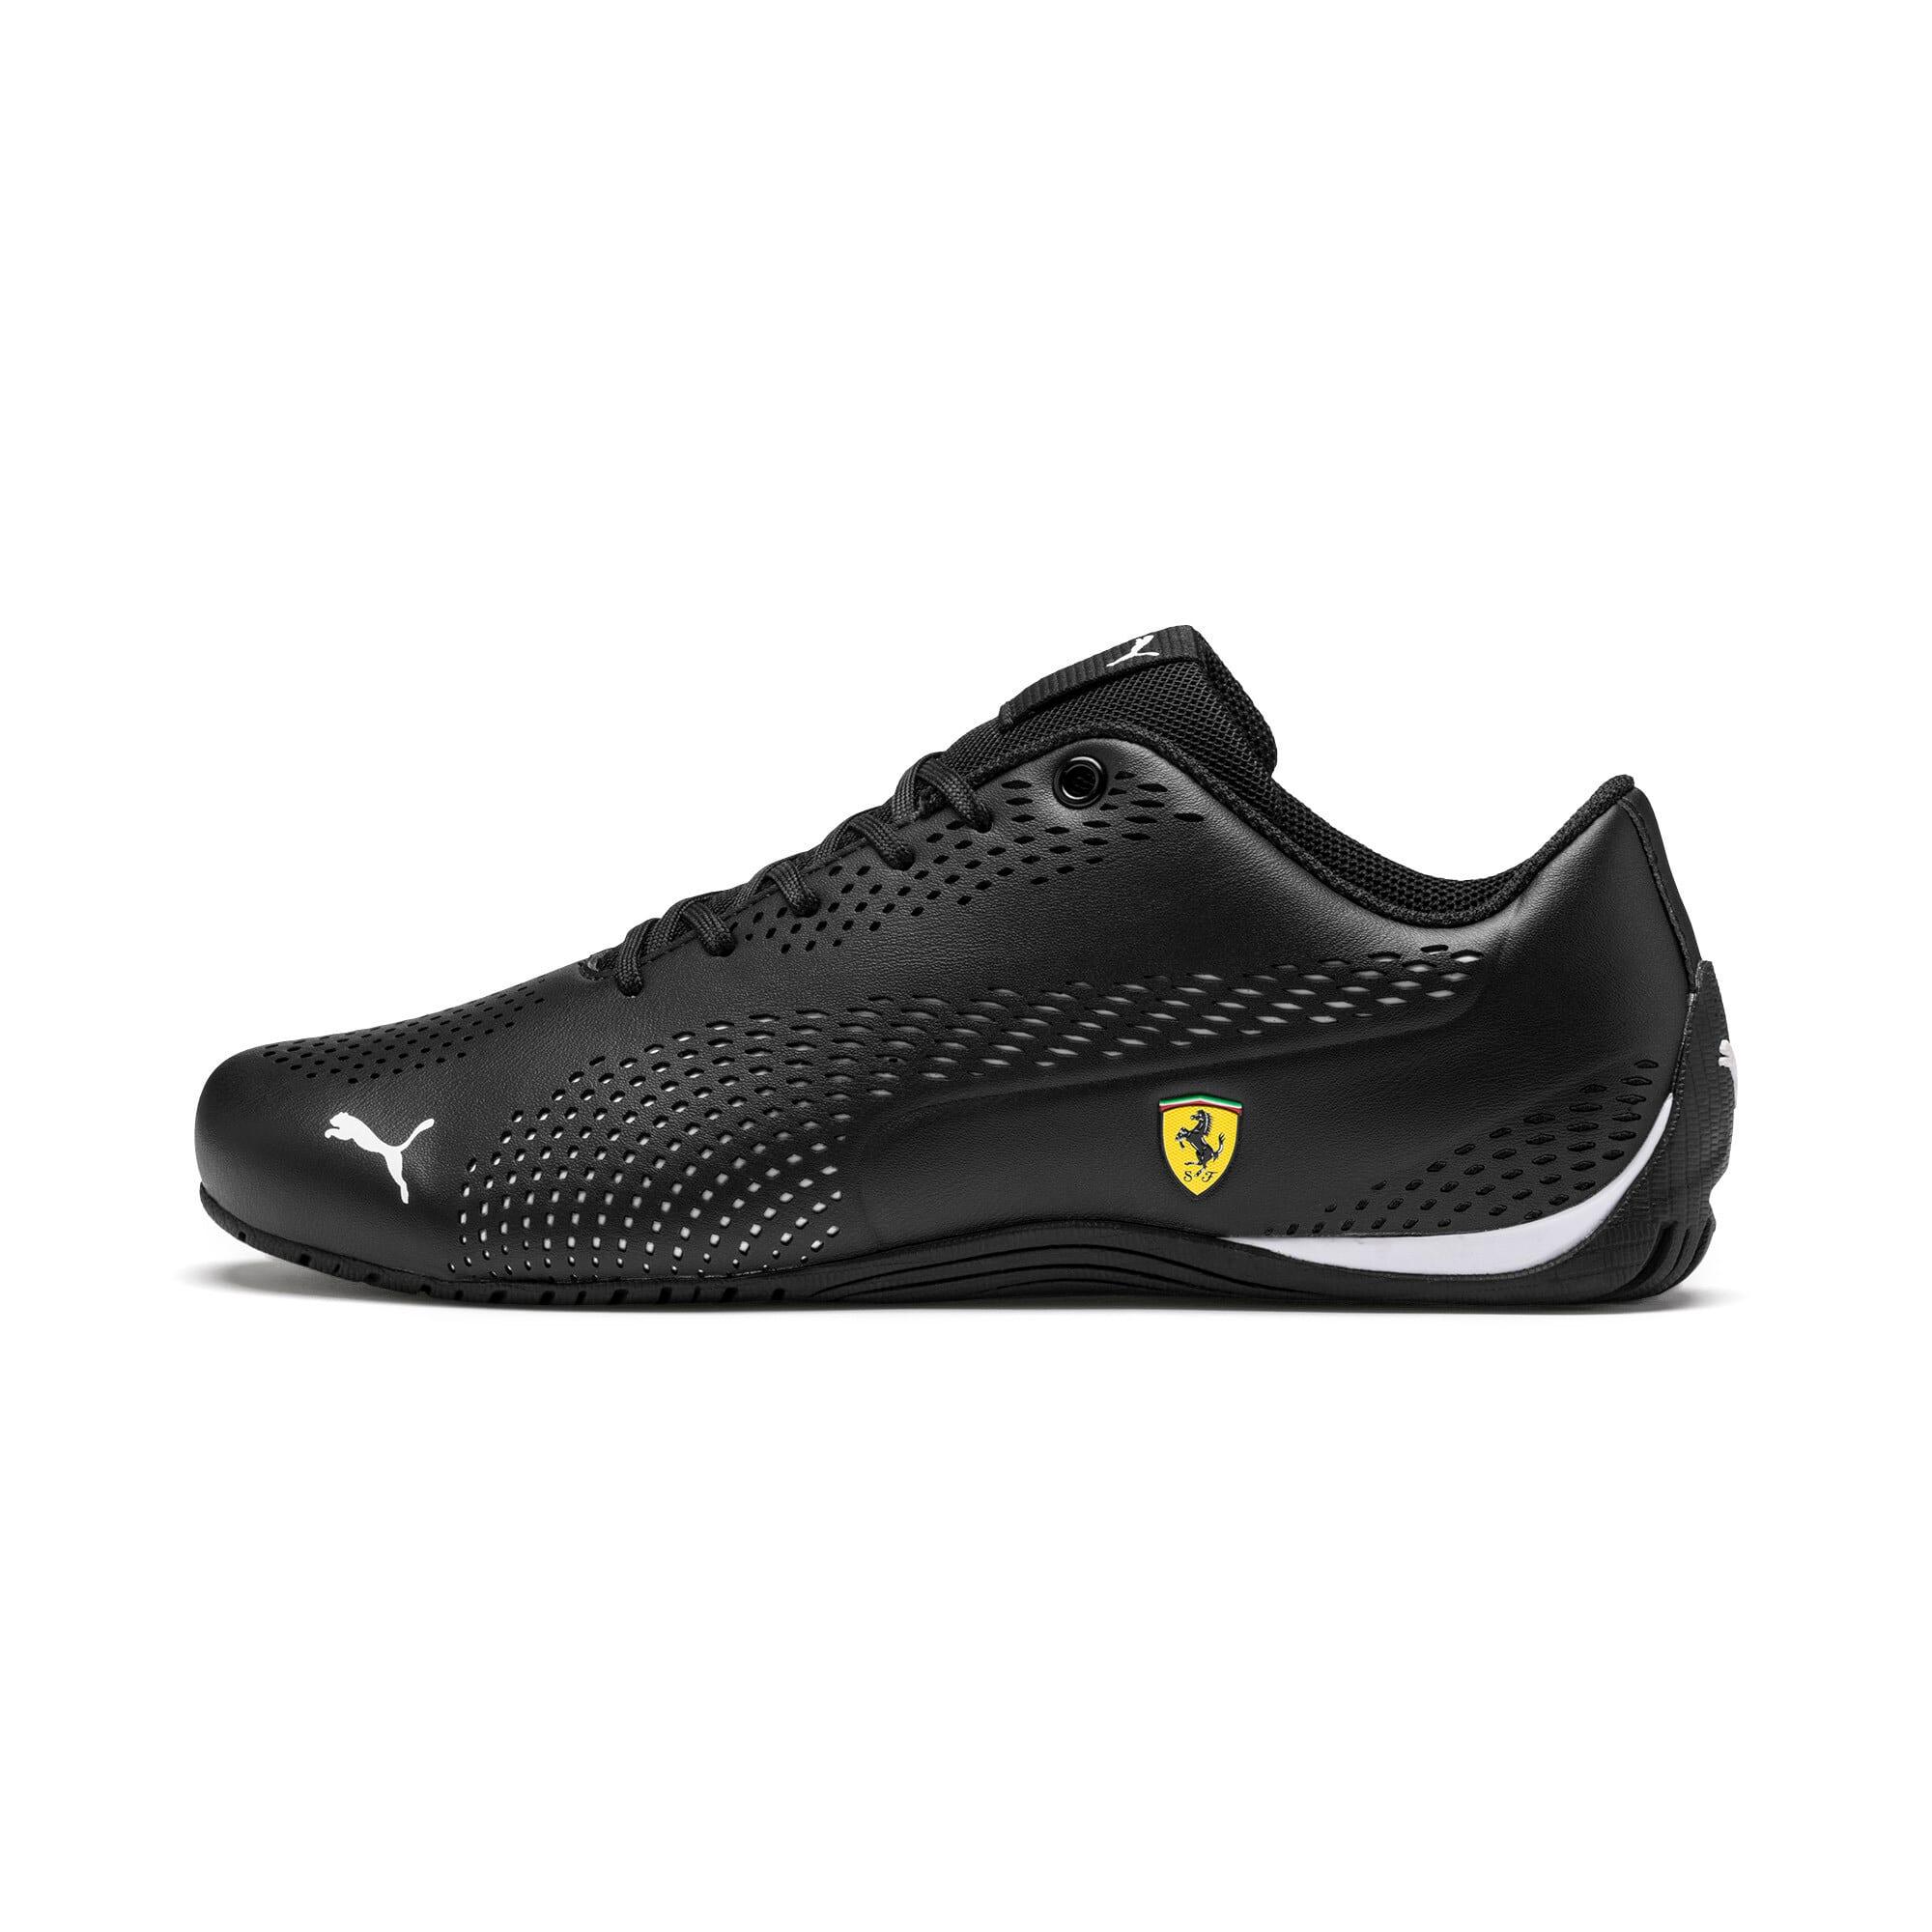 Thumbnail 1 of Scuderia Ferrari Drift Cat 5 Ultra II Men's Shoes, Puma Black-Puma White, medium